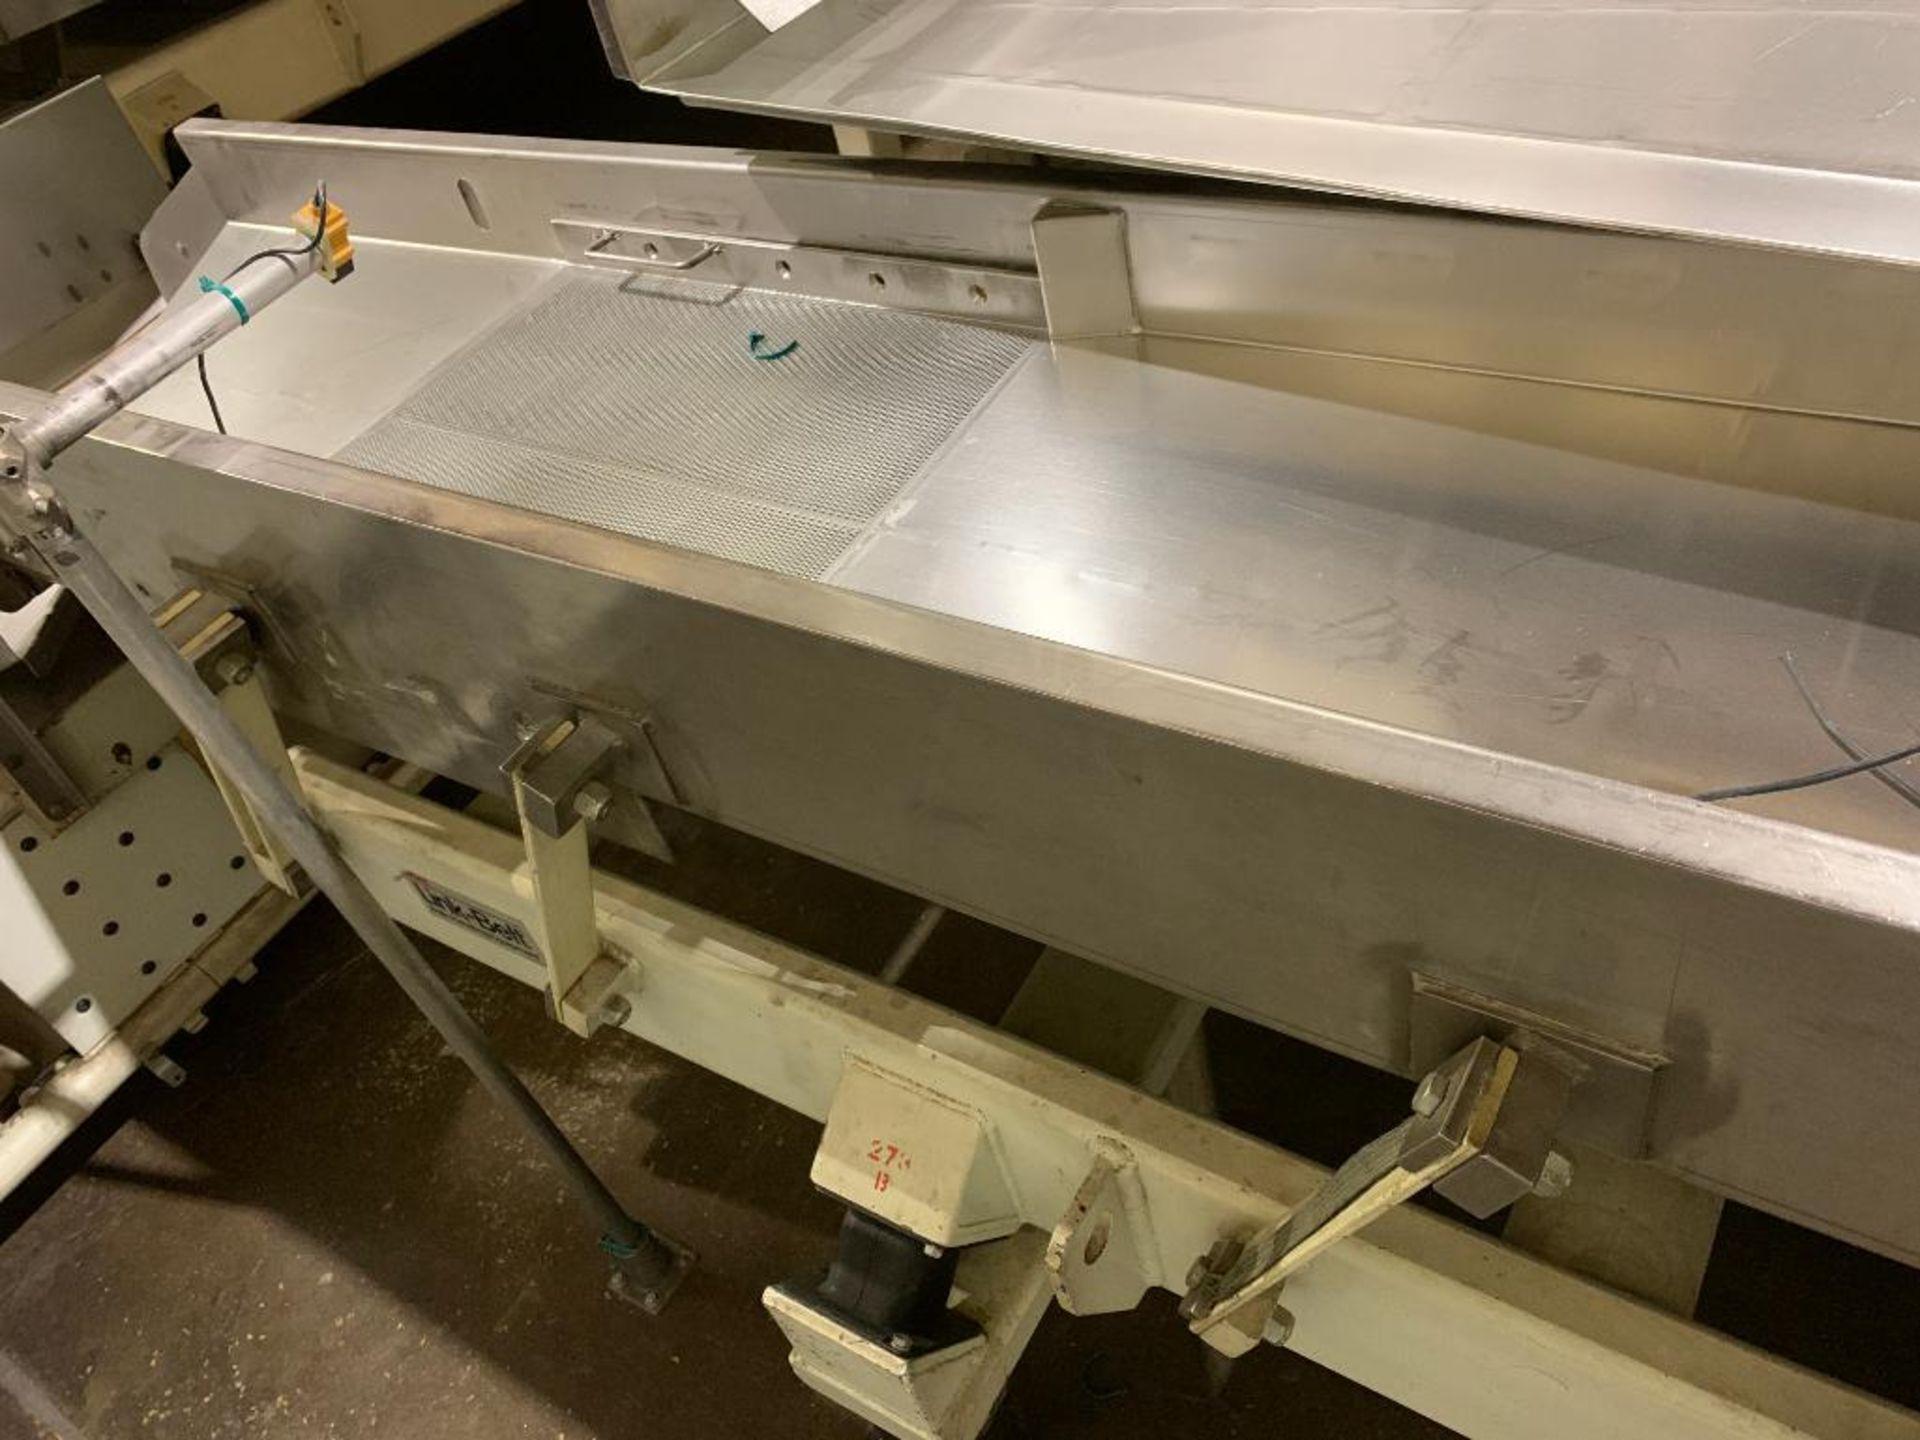 1992 Link-Belt vibratory conveyor, model LBL2405-10X12-10 - Image 4 of 34